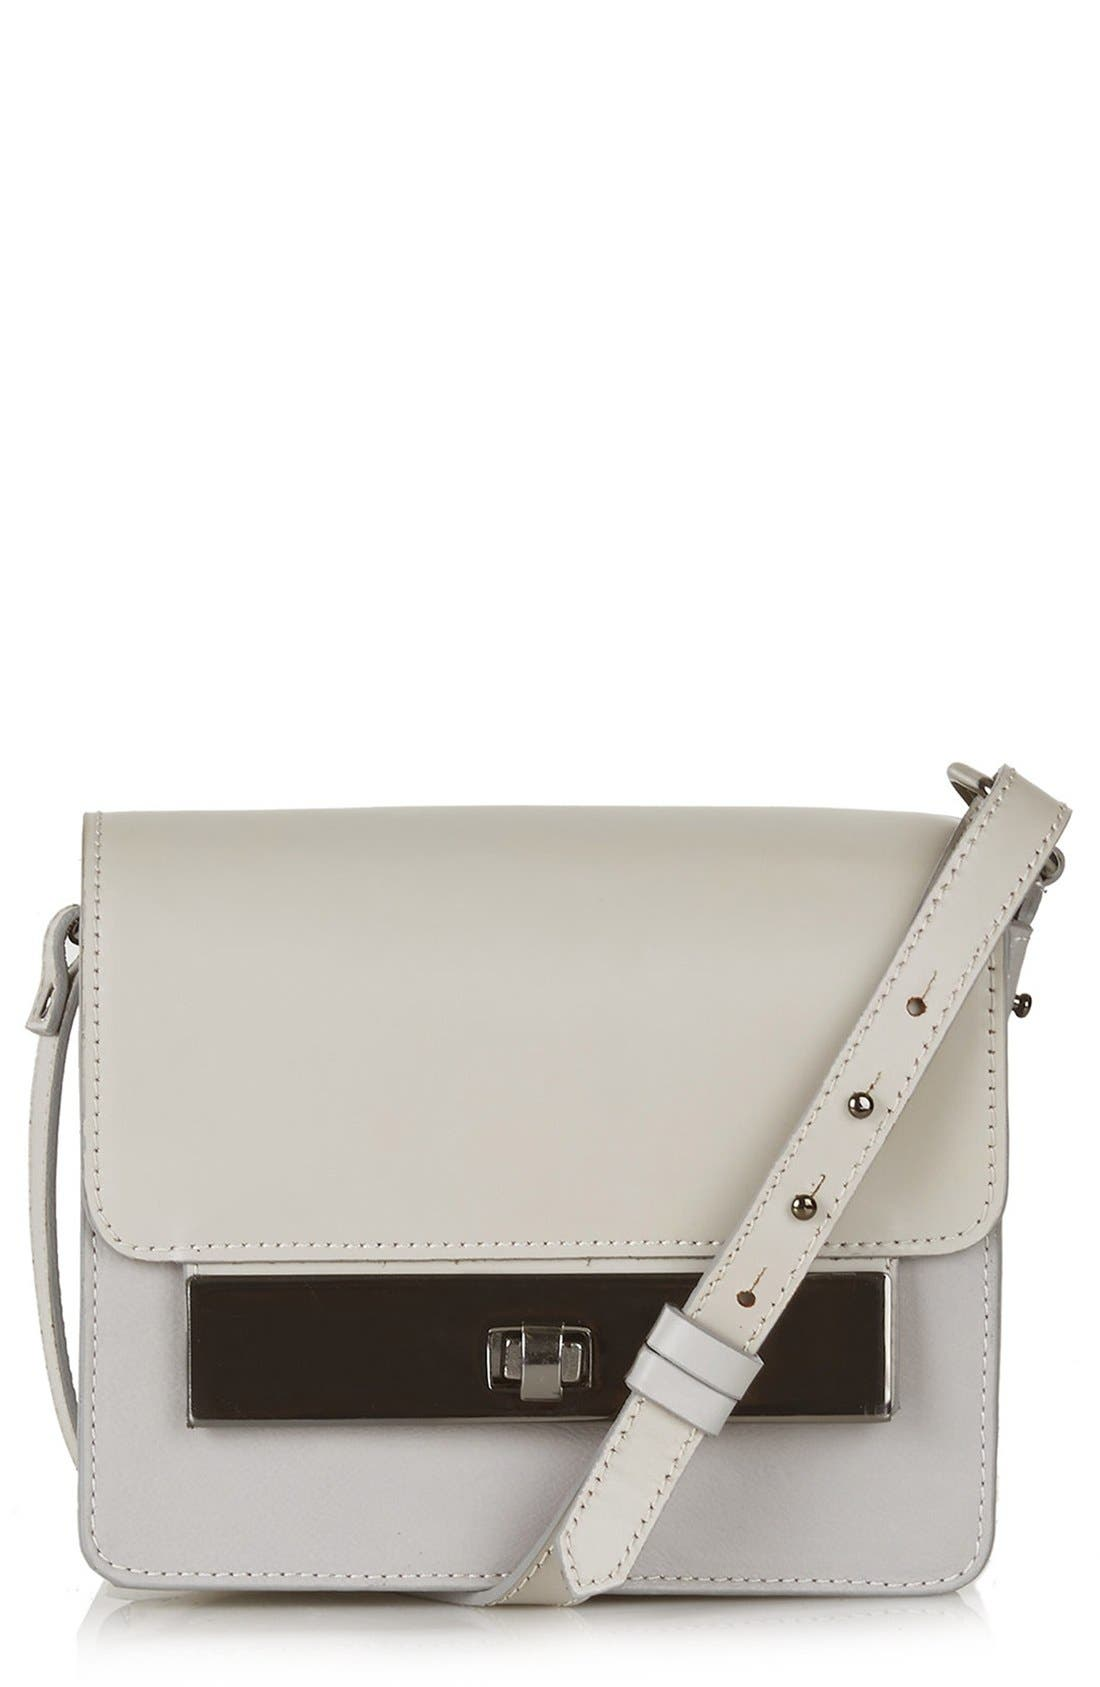 Alternate Image 1 Selected - Topshop Premium Plate Shoulder Bag